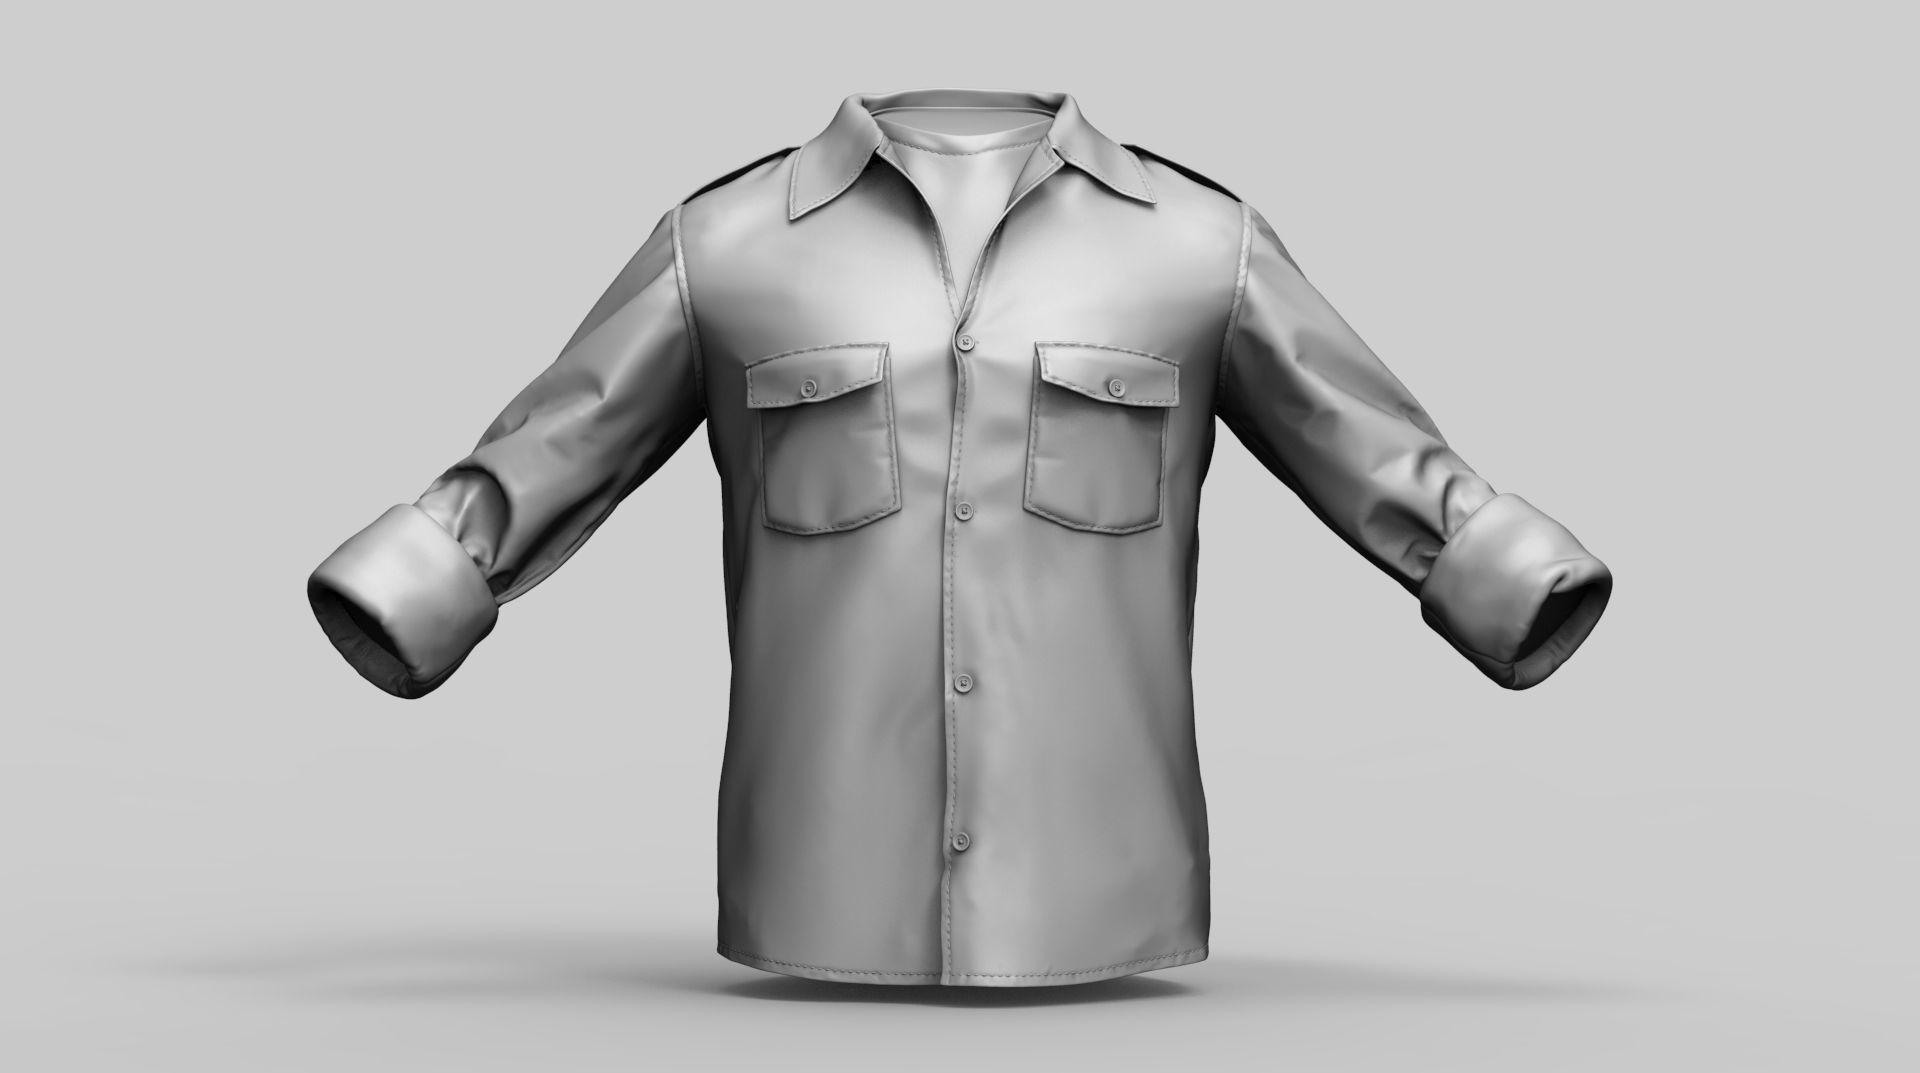 Qualitative Zbrush 3d model of Mens